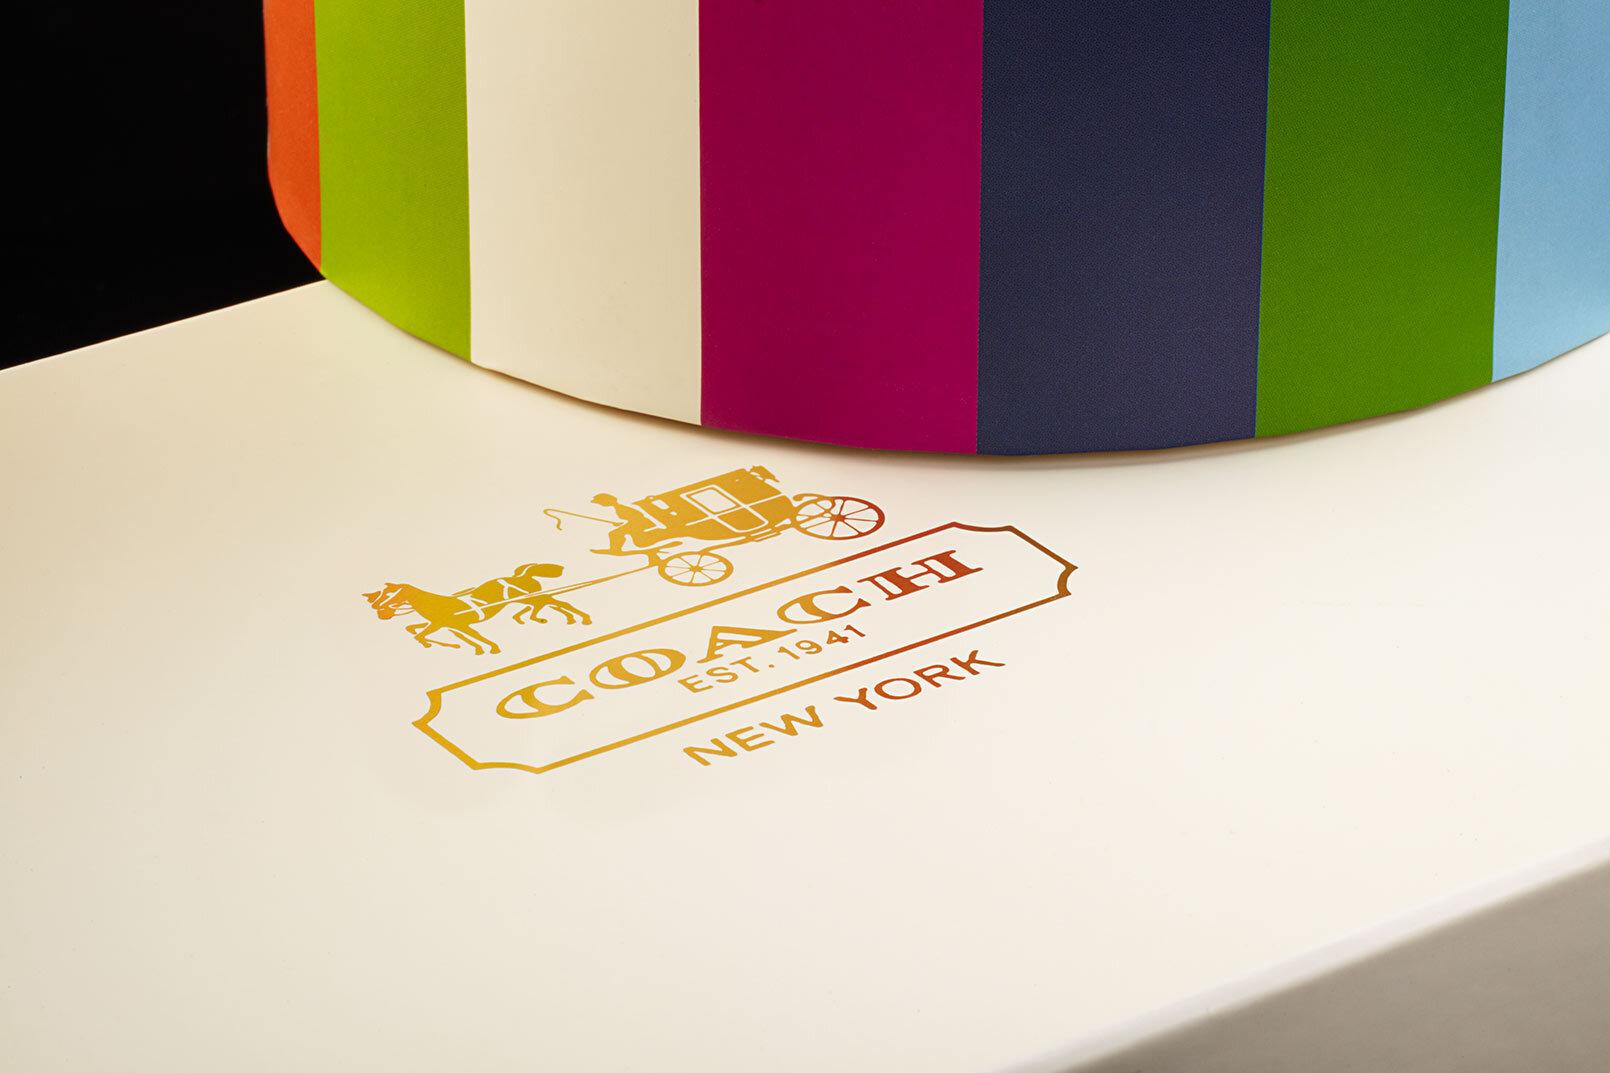 Coach-Box-Holiday-Design-Packaging-Company-5.jpg